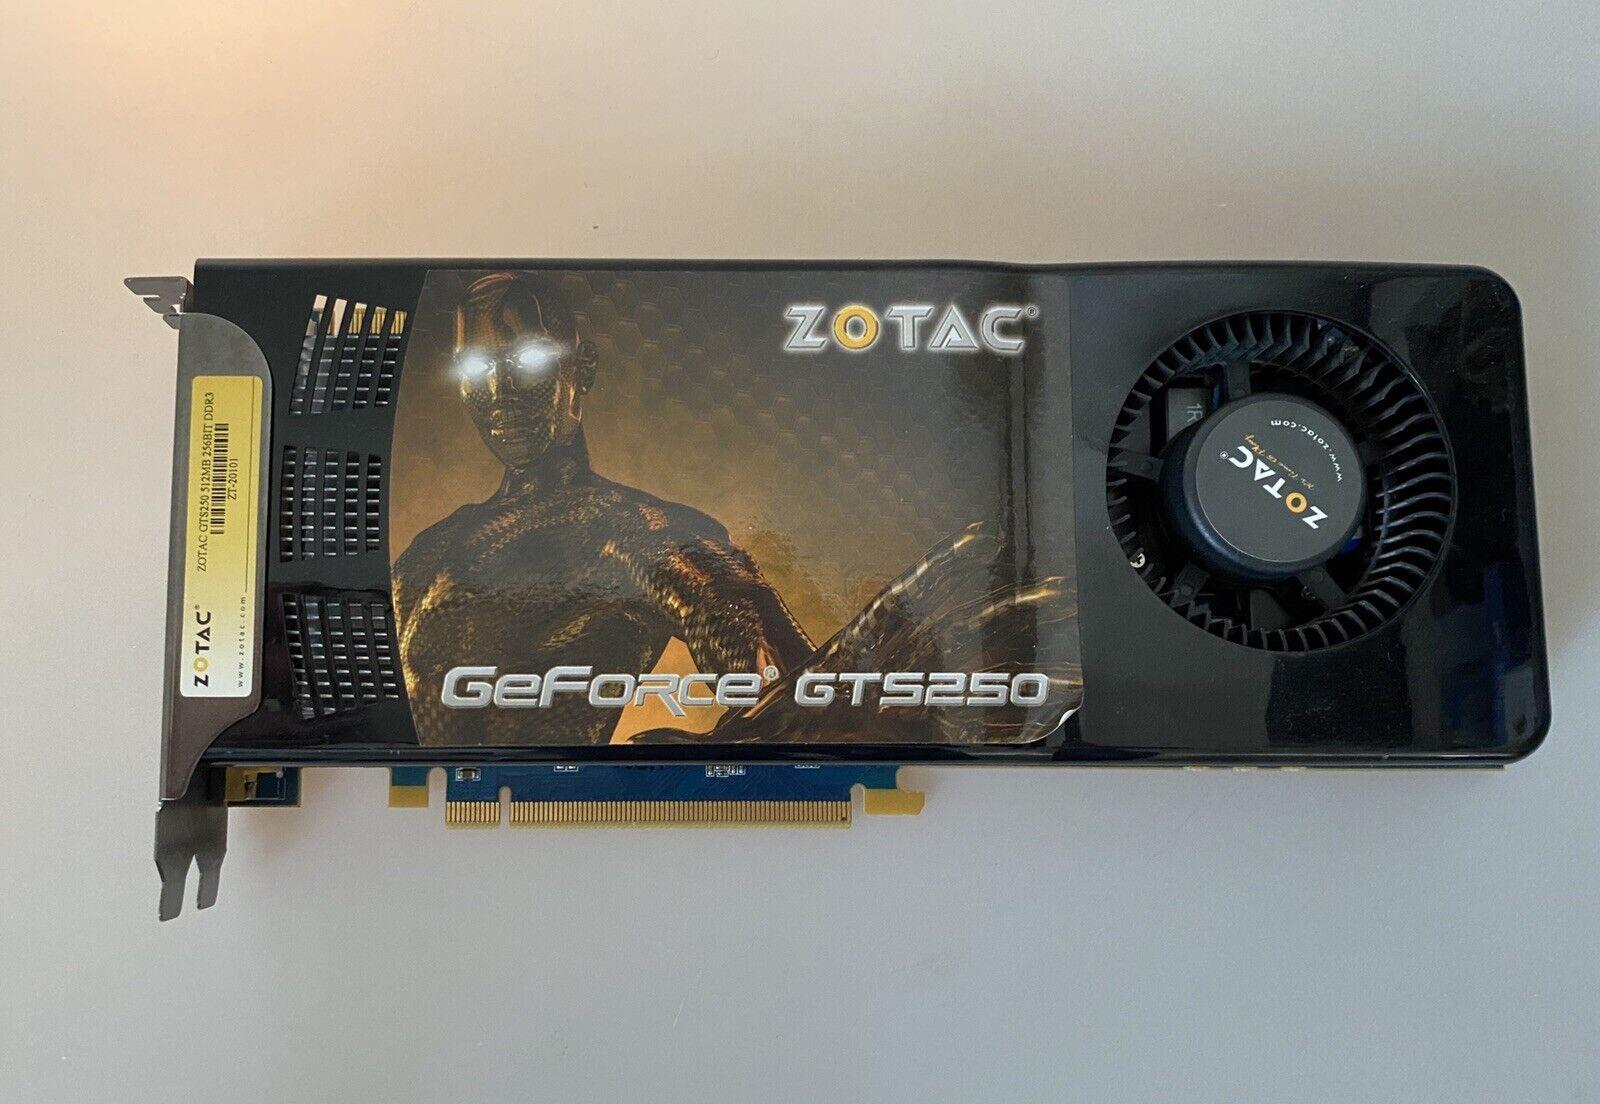 ZOTAC Video Card GeForce GTS 250